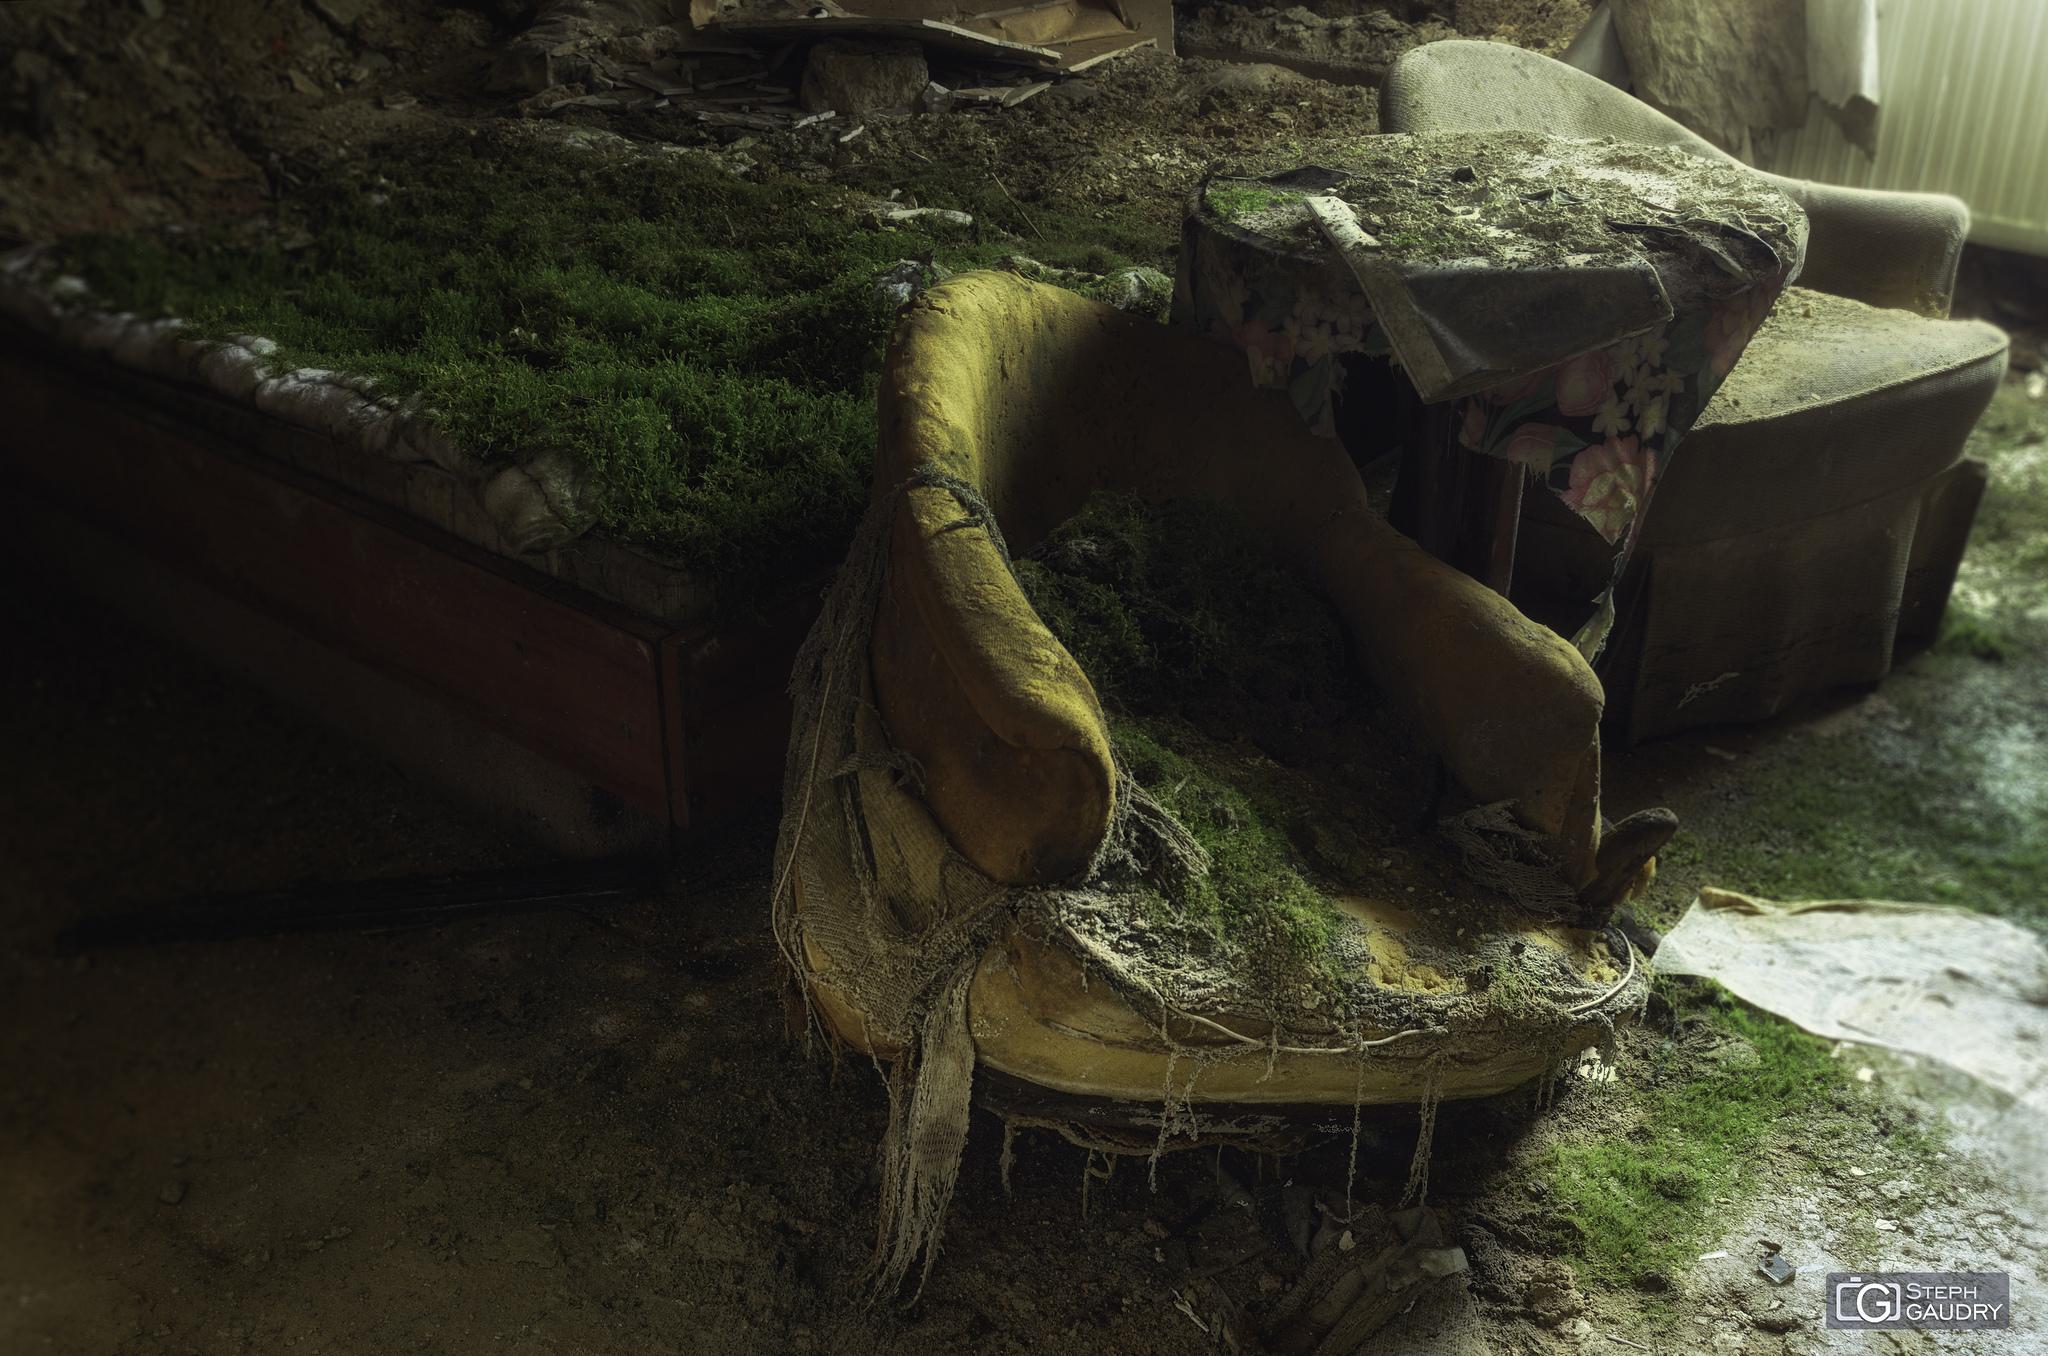 On fait son lit comme on se couche [Click to start slideshow]